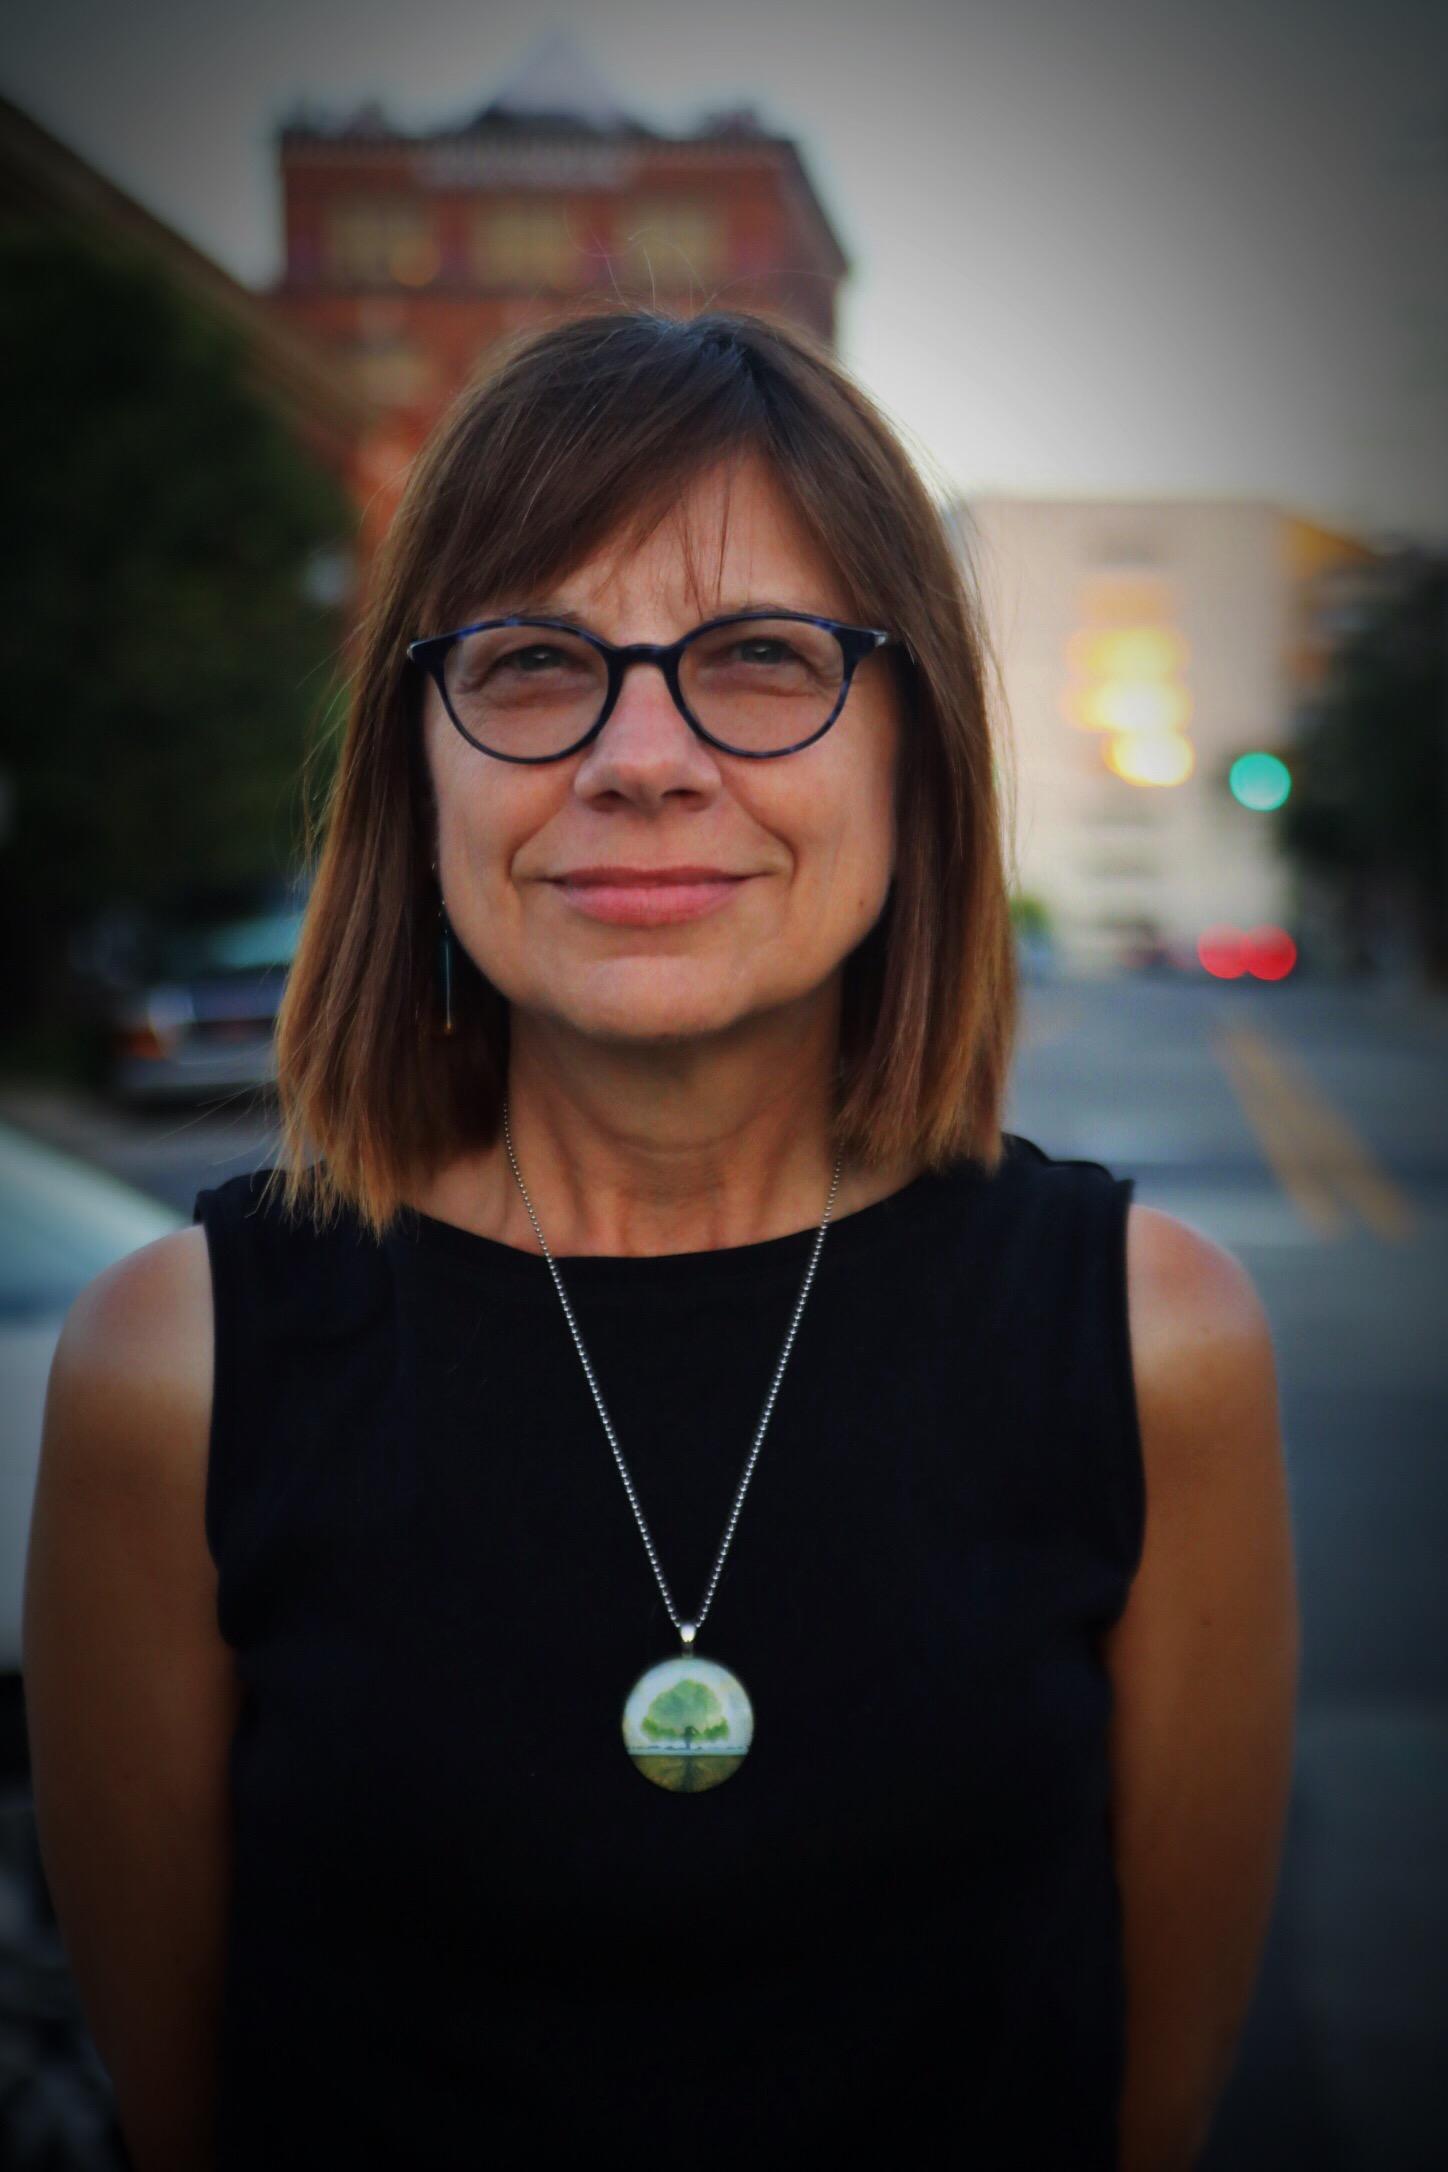 Heidi - July 2019